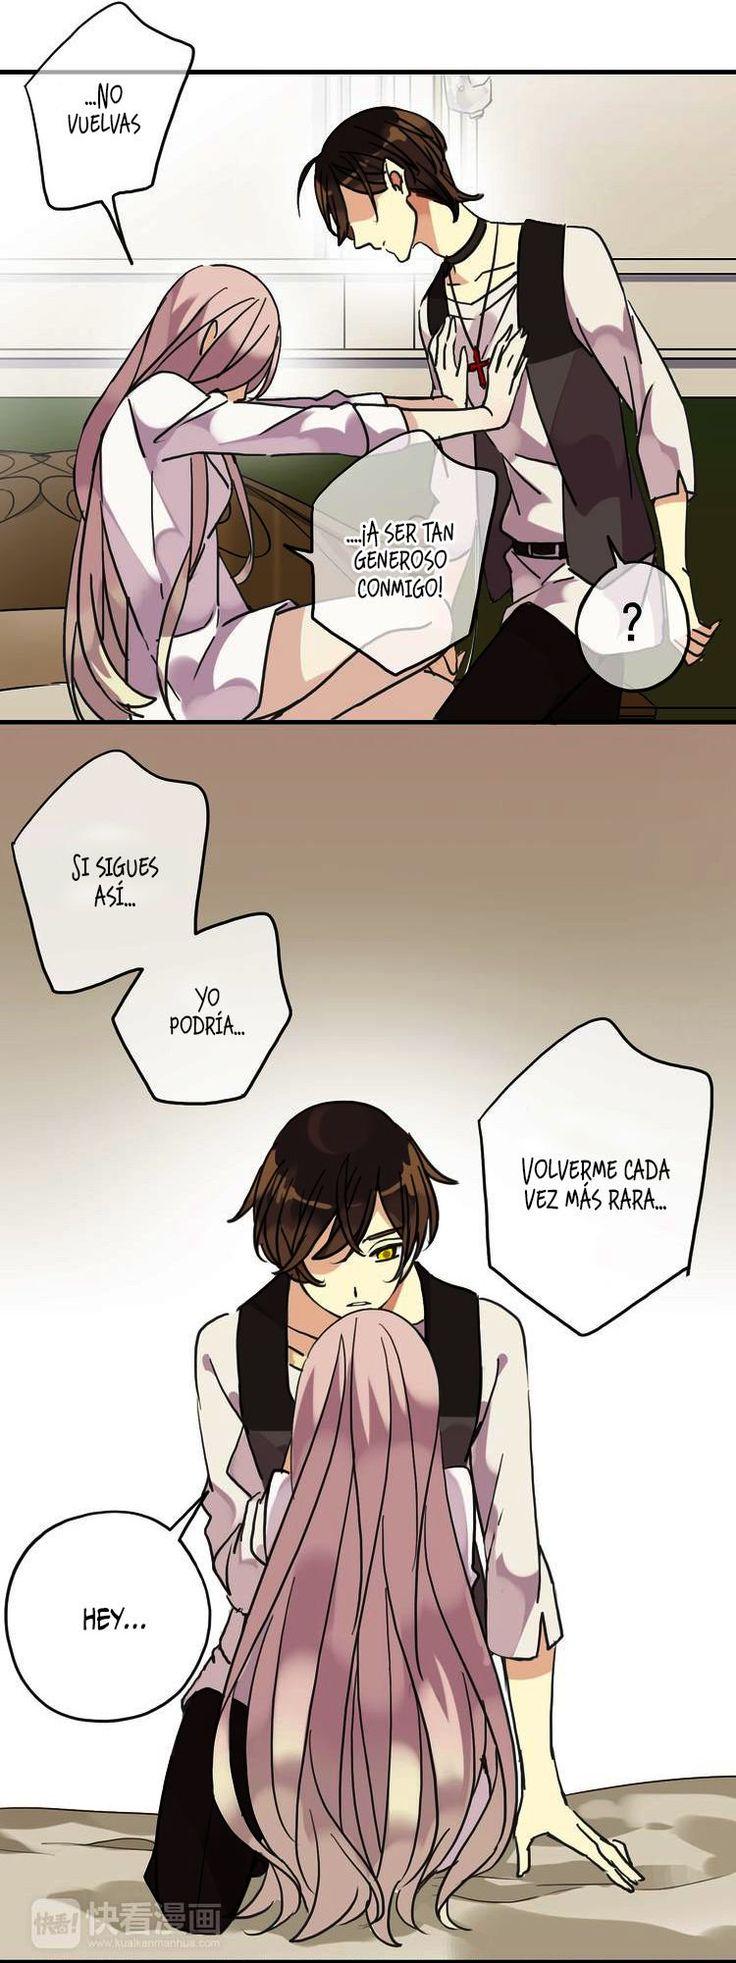 Dulces Mordidas Capítulo 24 página 32 - Leer Manga en Español gratis en NineManga.com